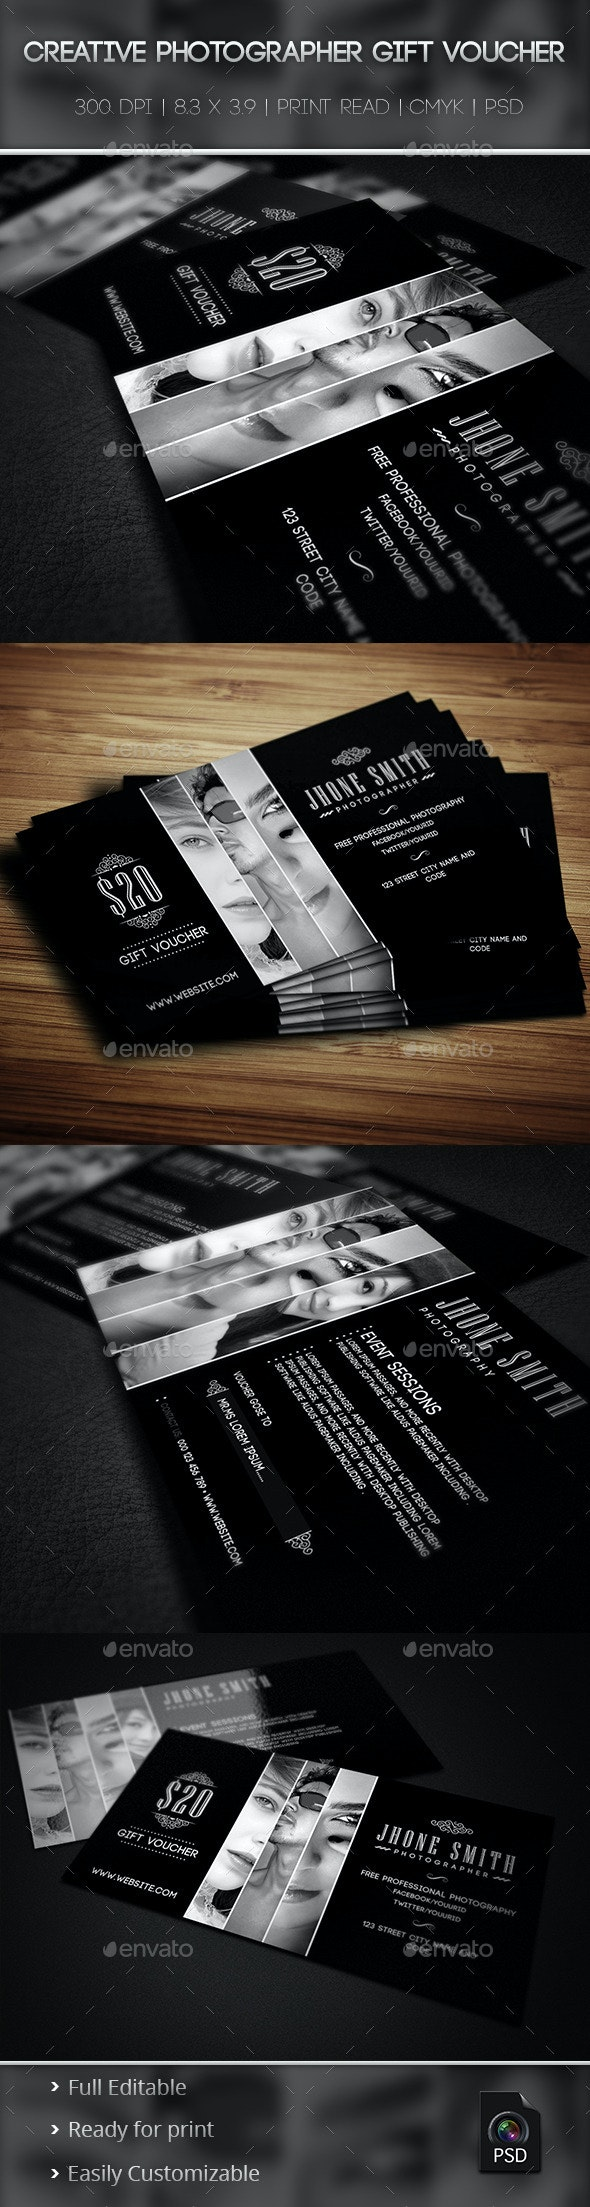 Creative Photographer Gift Voucher 01